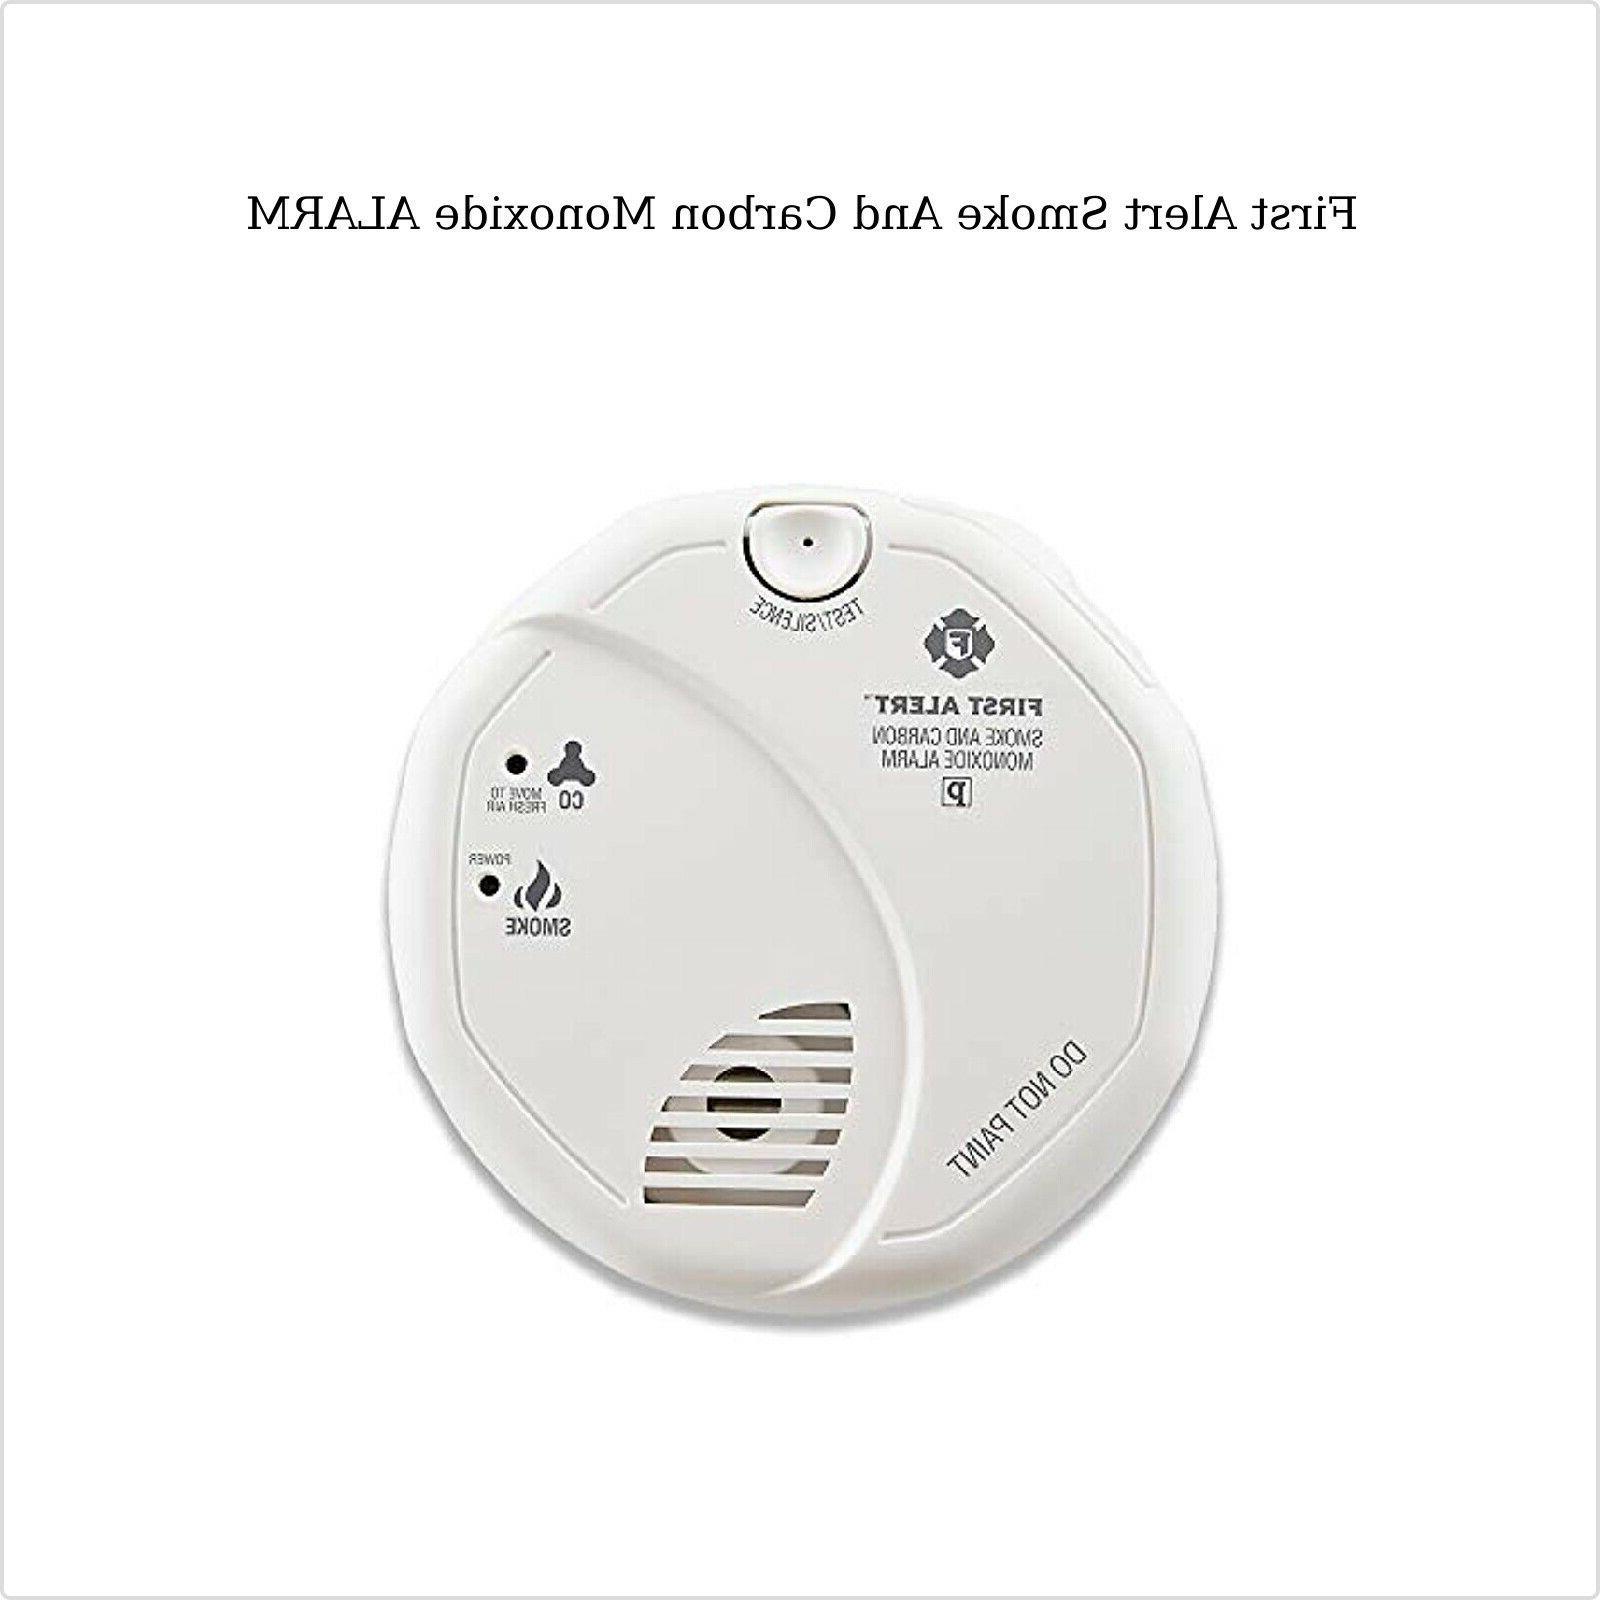 brk hardwired smoke alarm and carbon monoxide